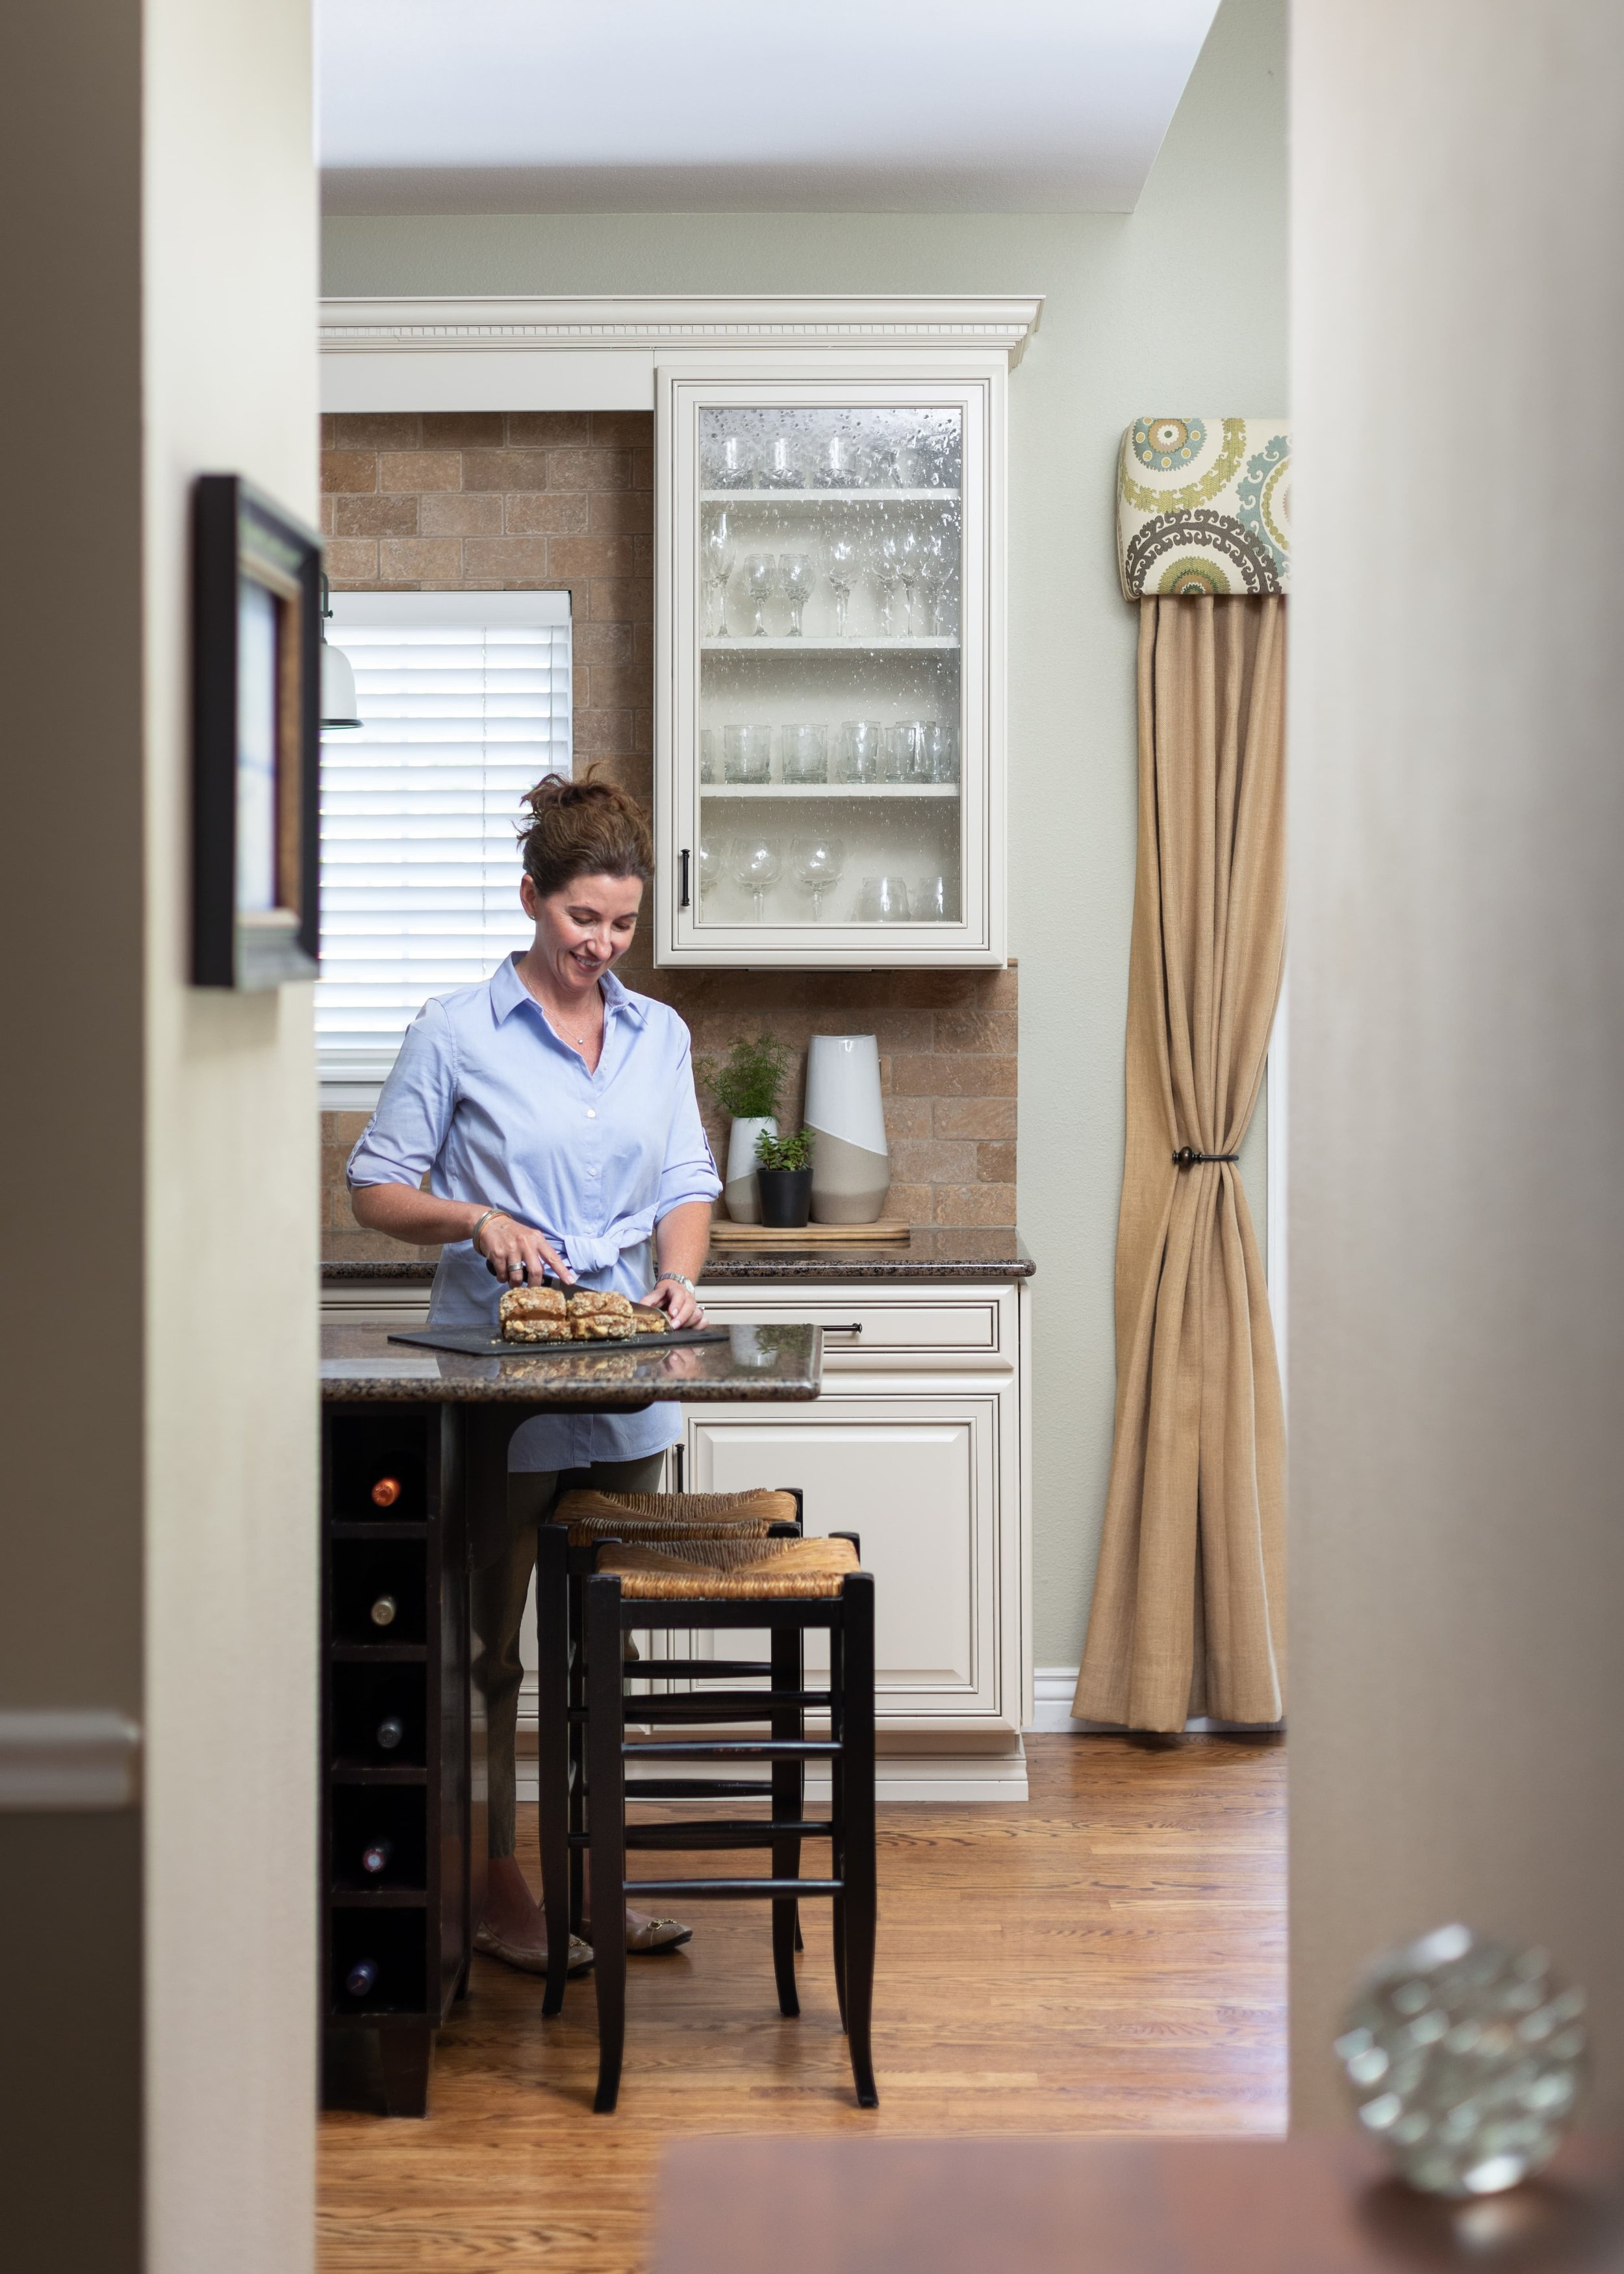 20180719_adorn_interiors_roslyn kitchen_05_photo by tim gormley.jpg